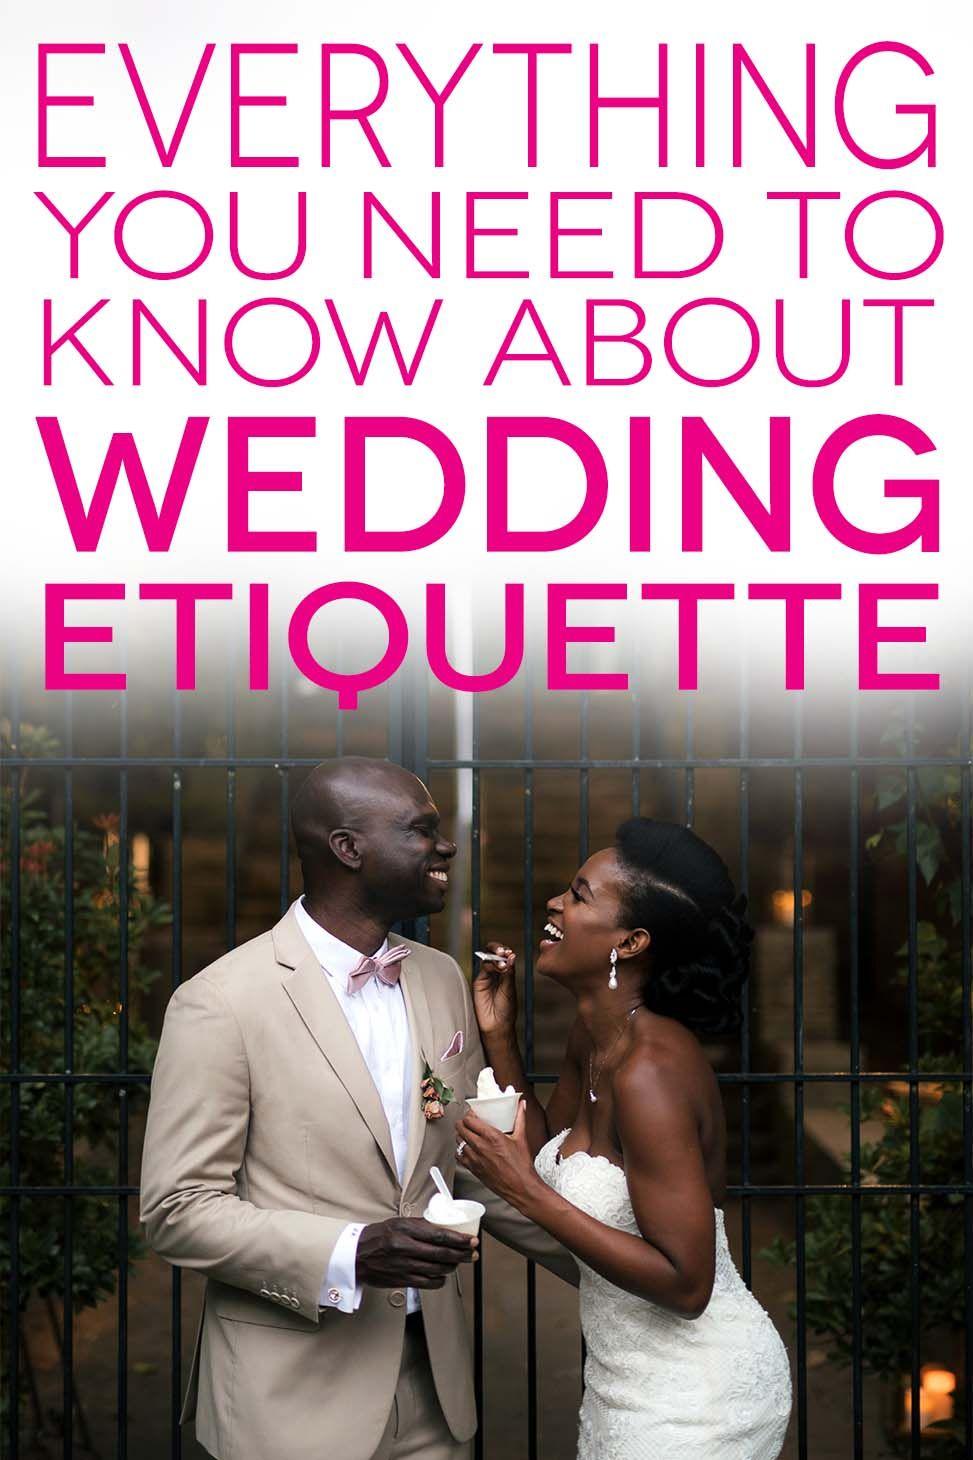 21 Modern Wedding Etiquette Questions Answered A Practical Wedding Wedding Etiquette Practical Wedding Diy Wedding Planning